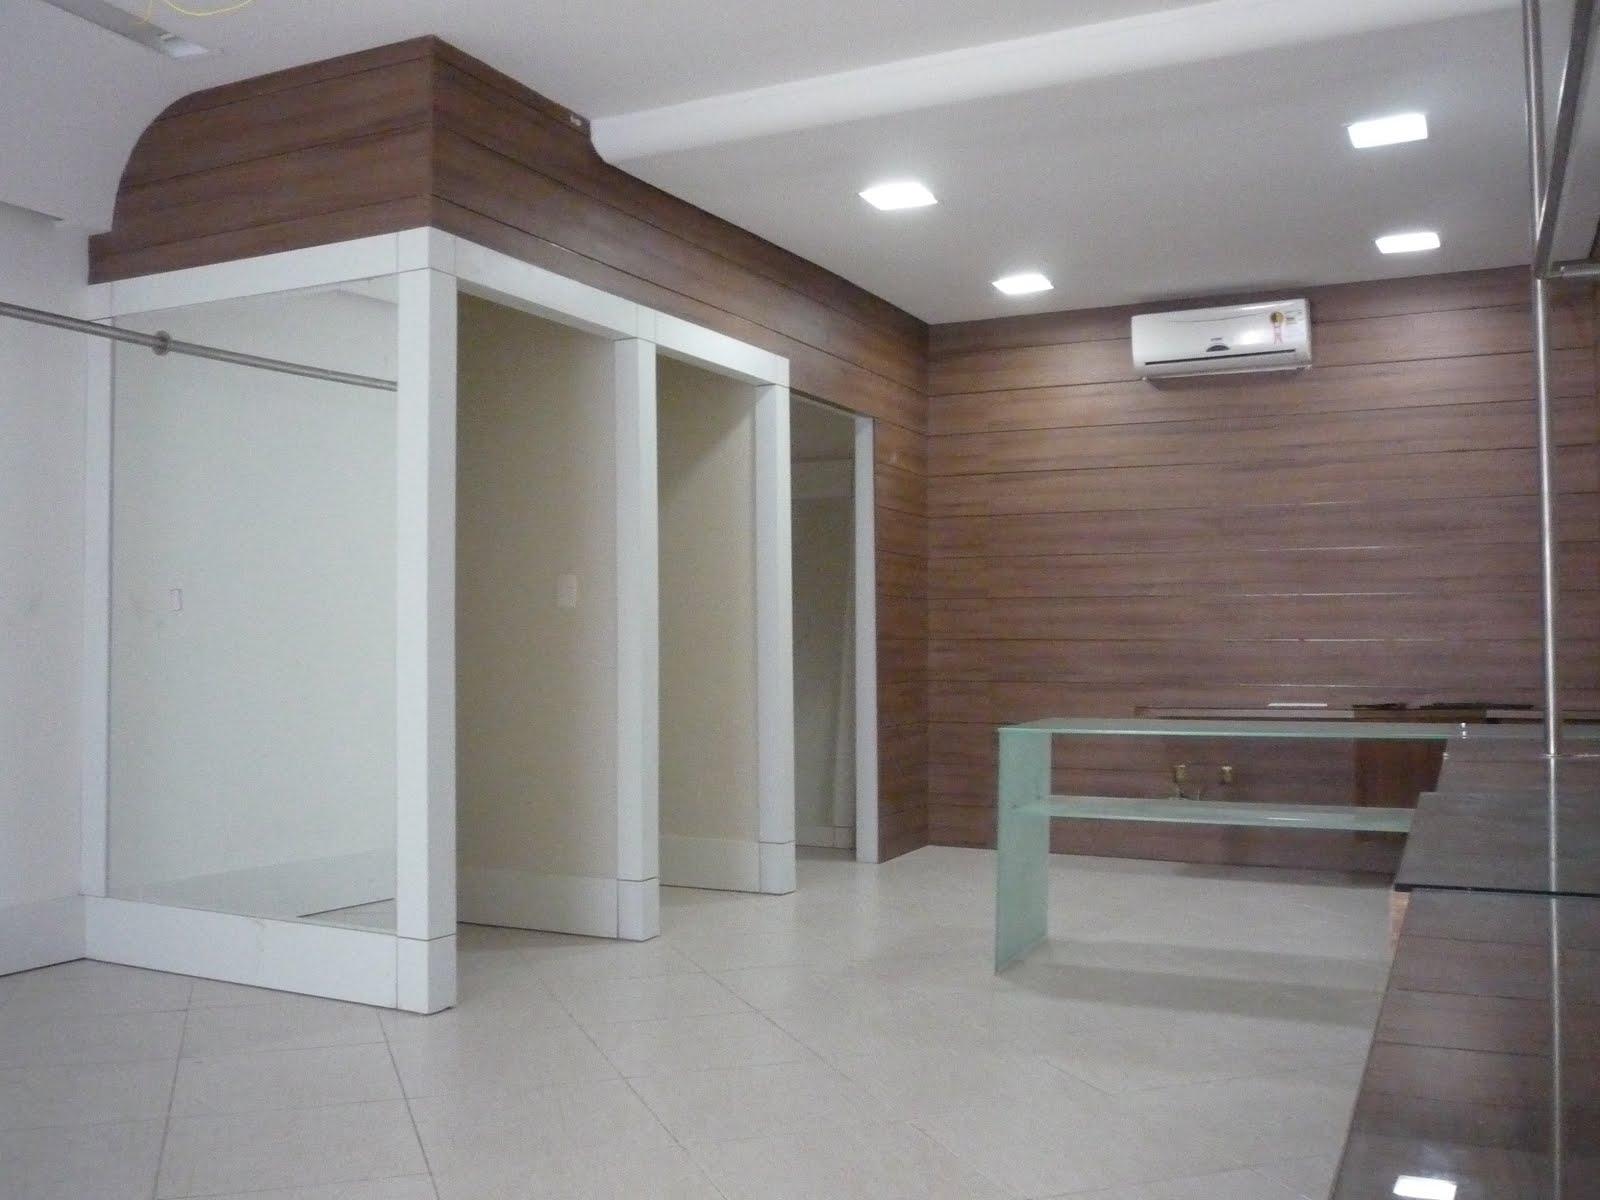 Suficiente ROBERTO WAGNER ARAÚJO Arquitetura & Interiores: PROJ LOJA  FV92